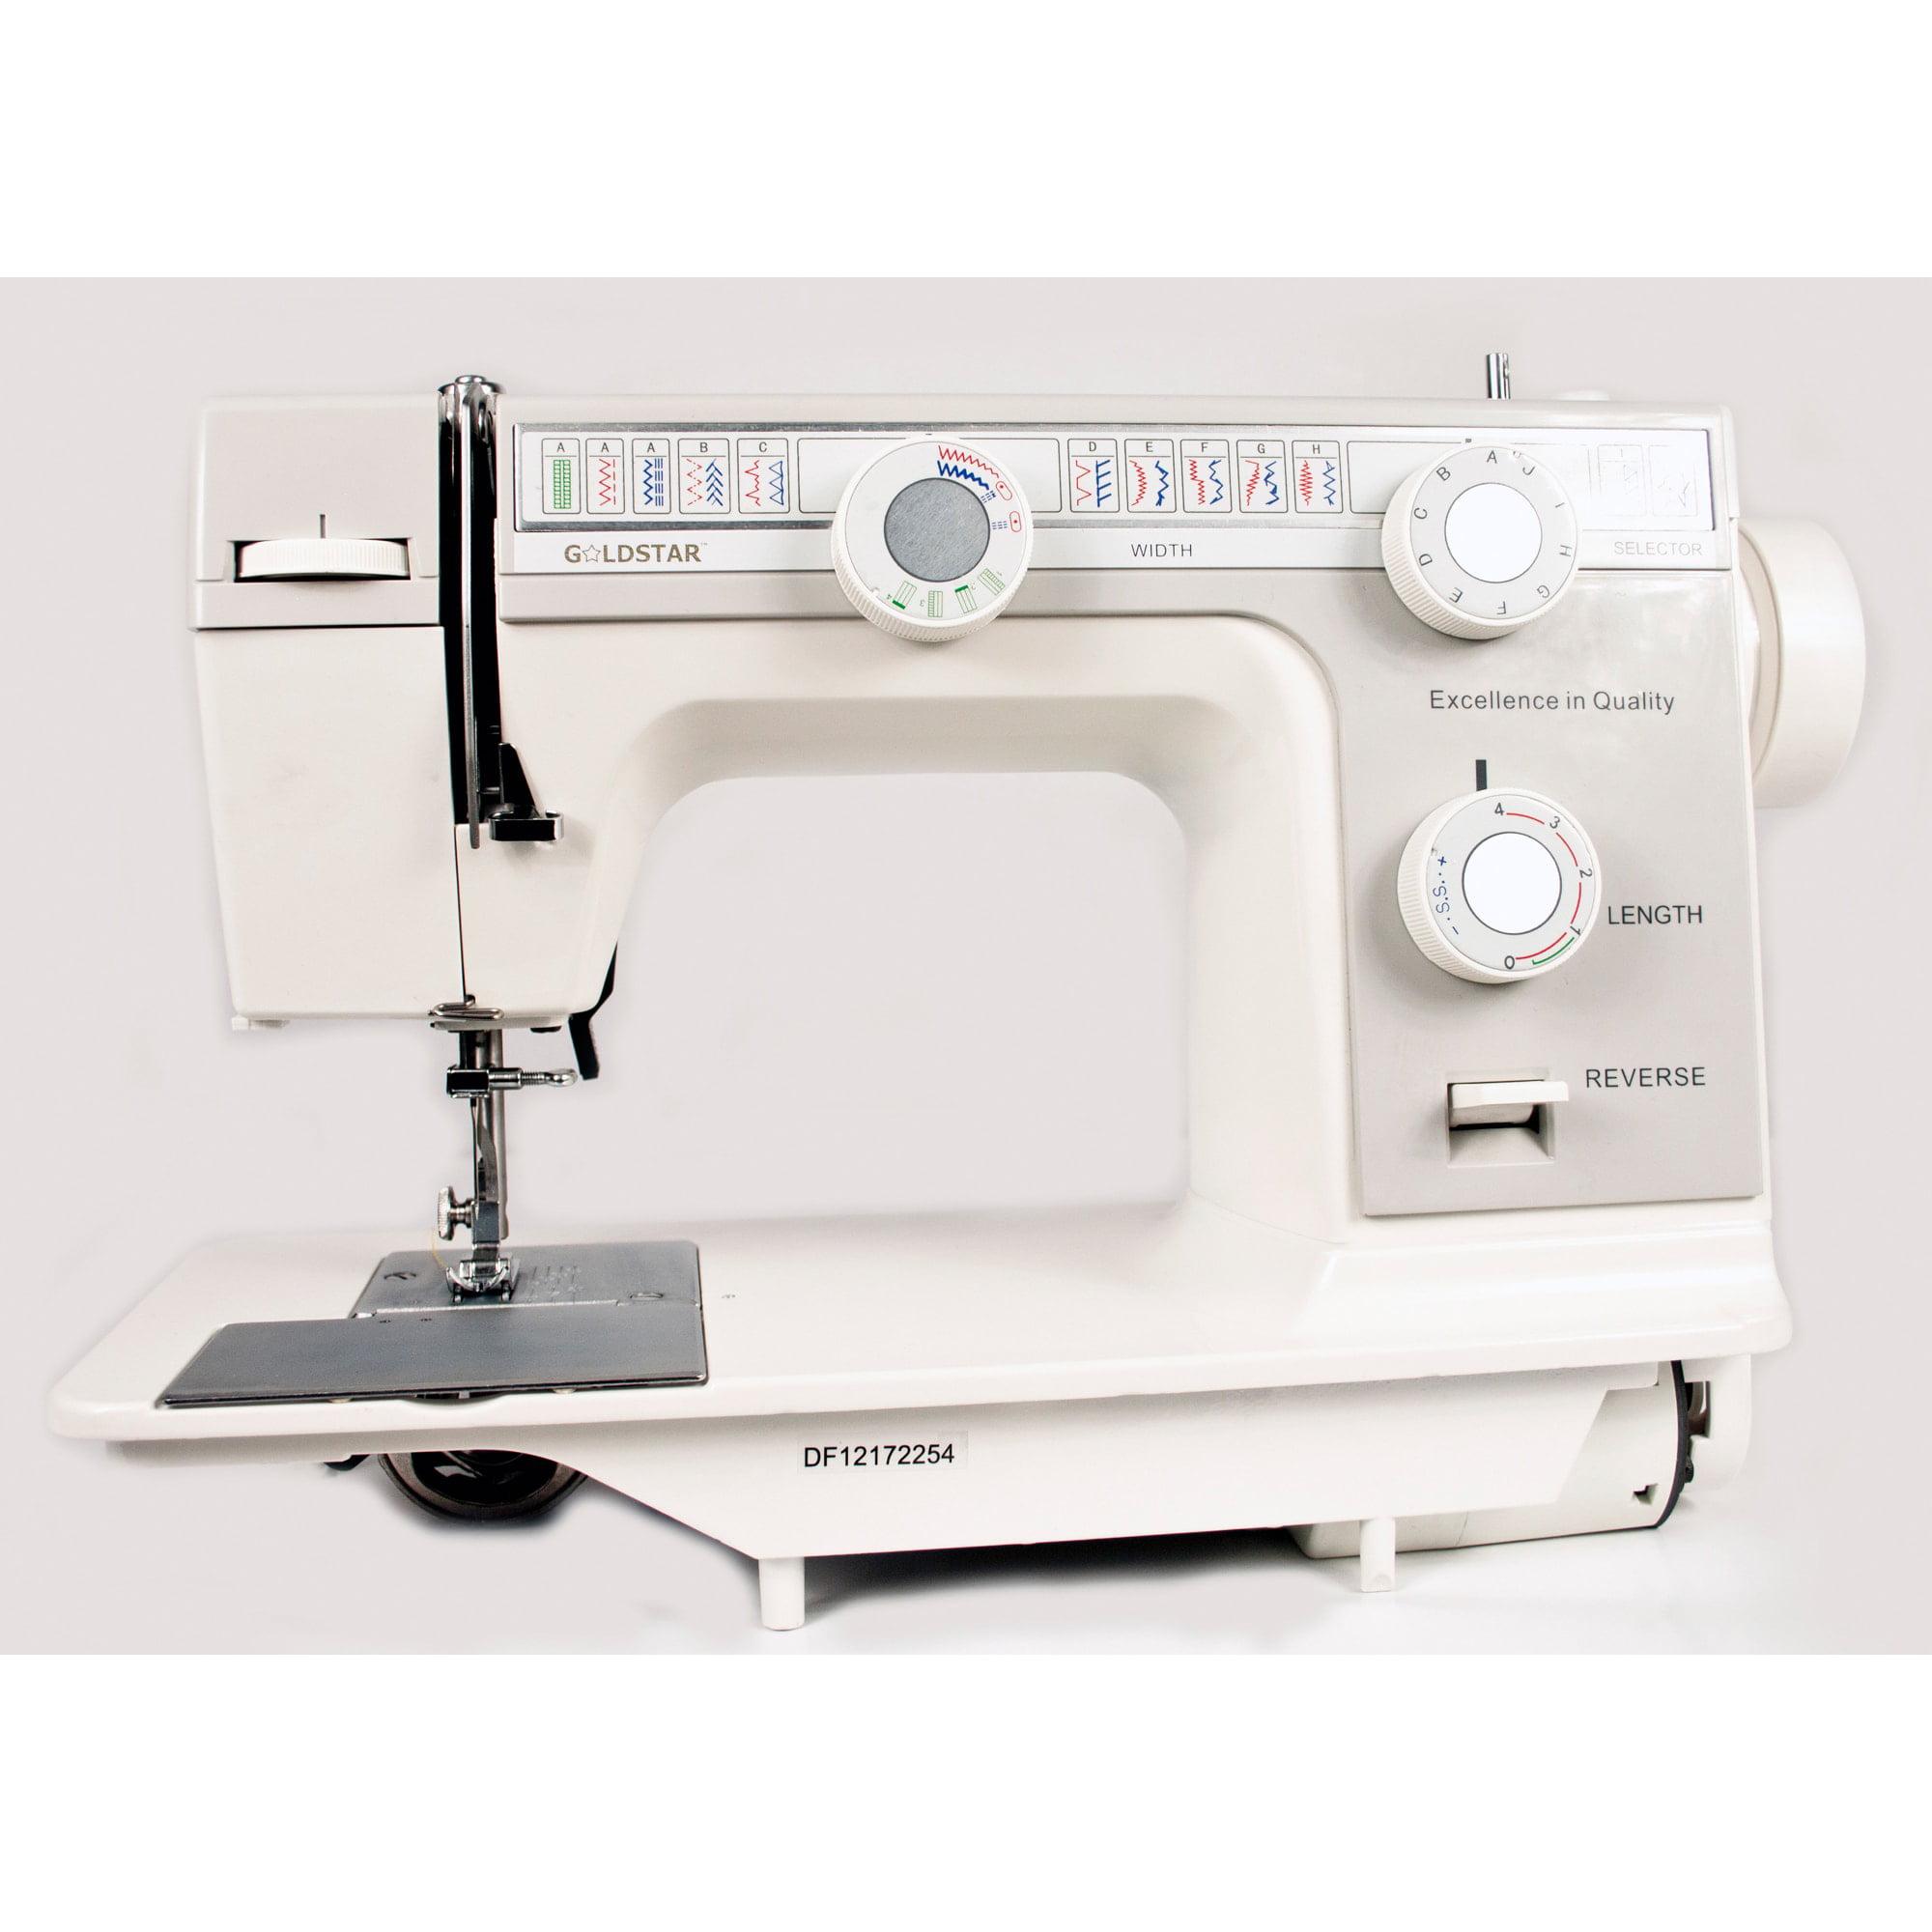 Feiyue Goldstar Flat Bed Sewing Machine with Bonus Carrying Case/ Base